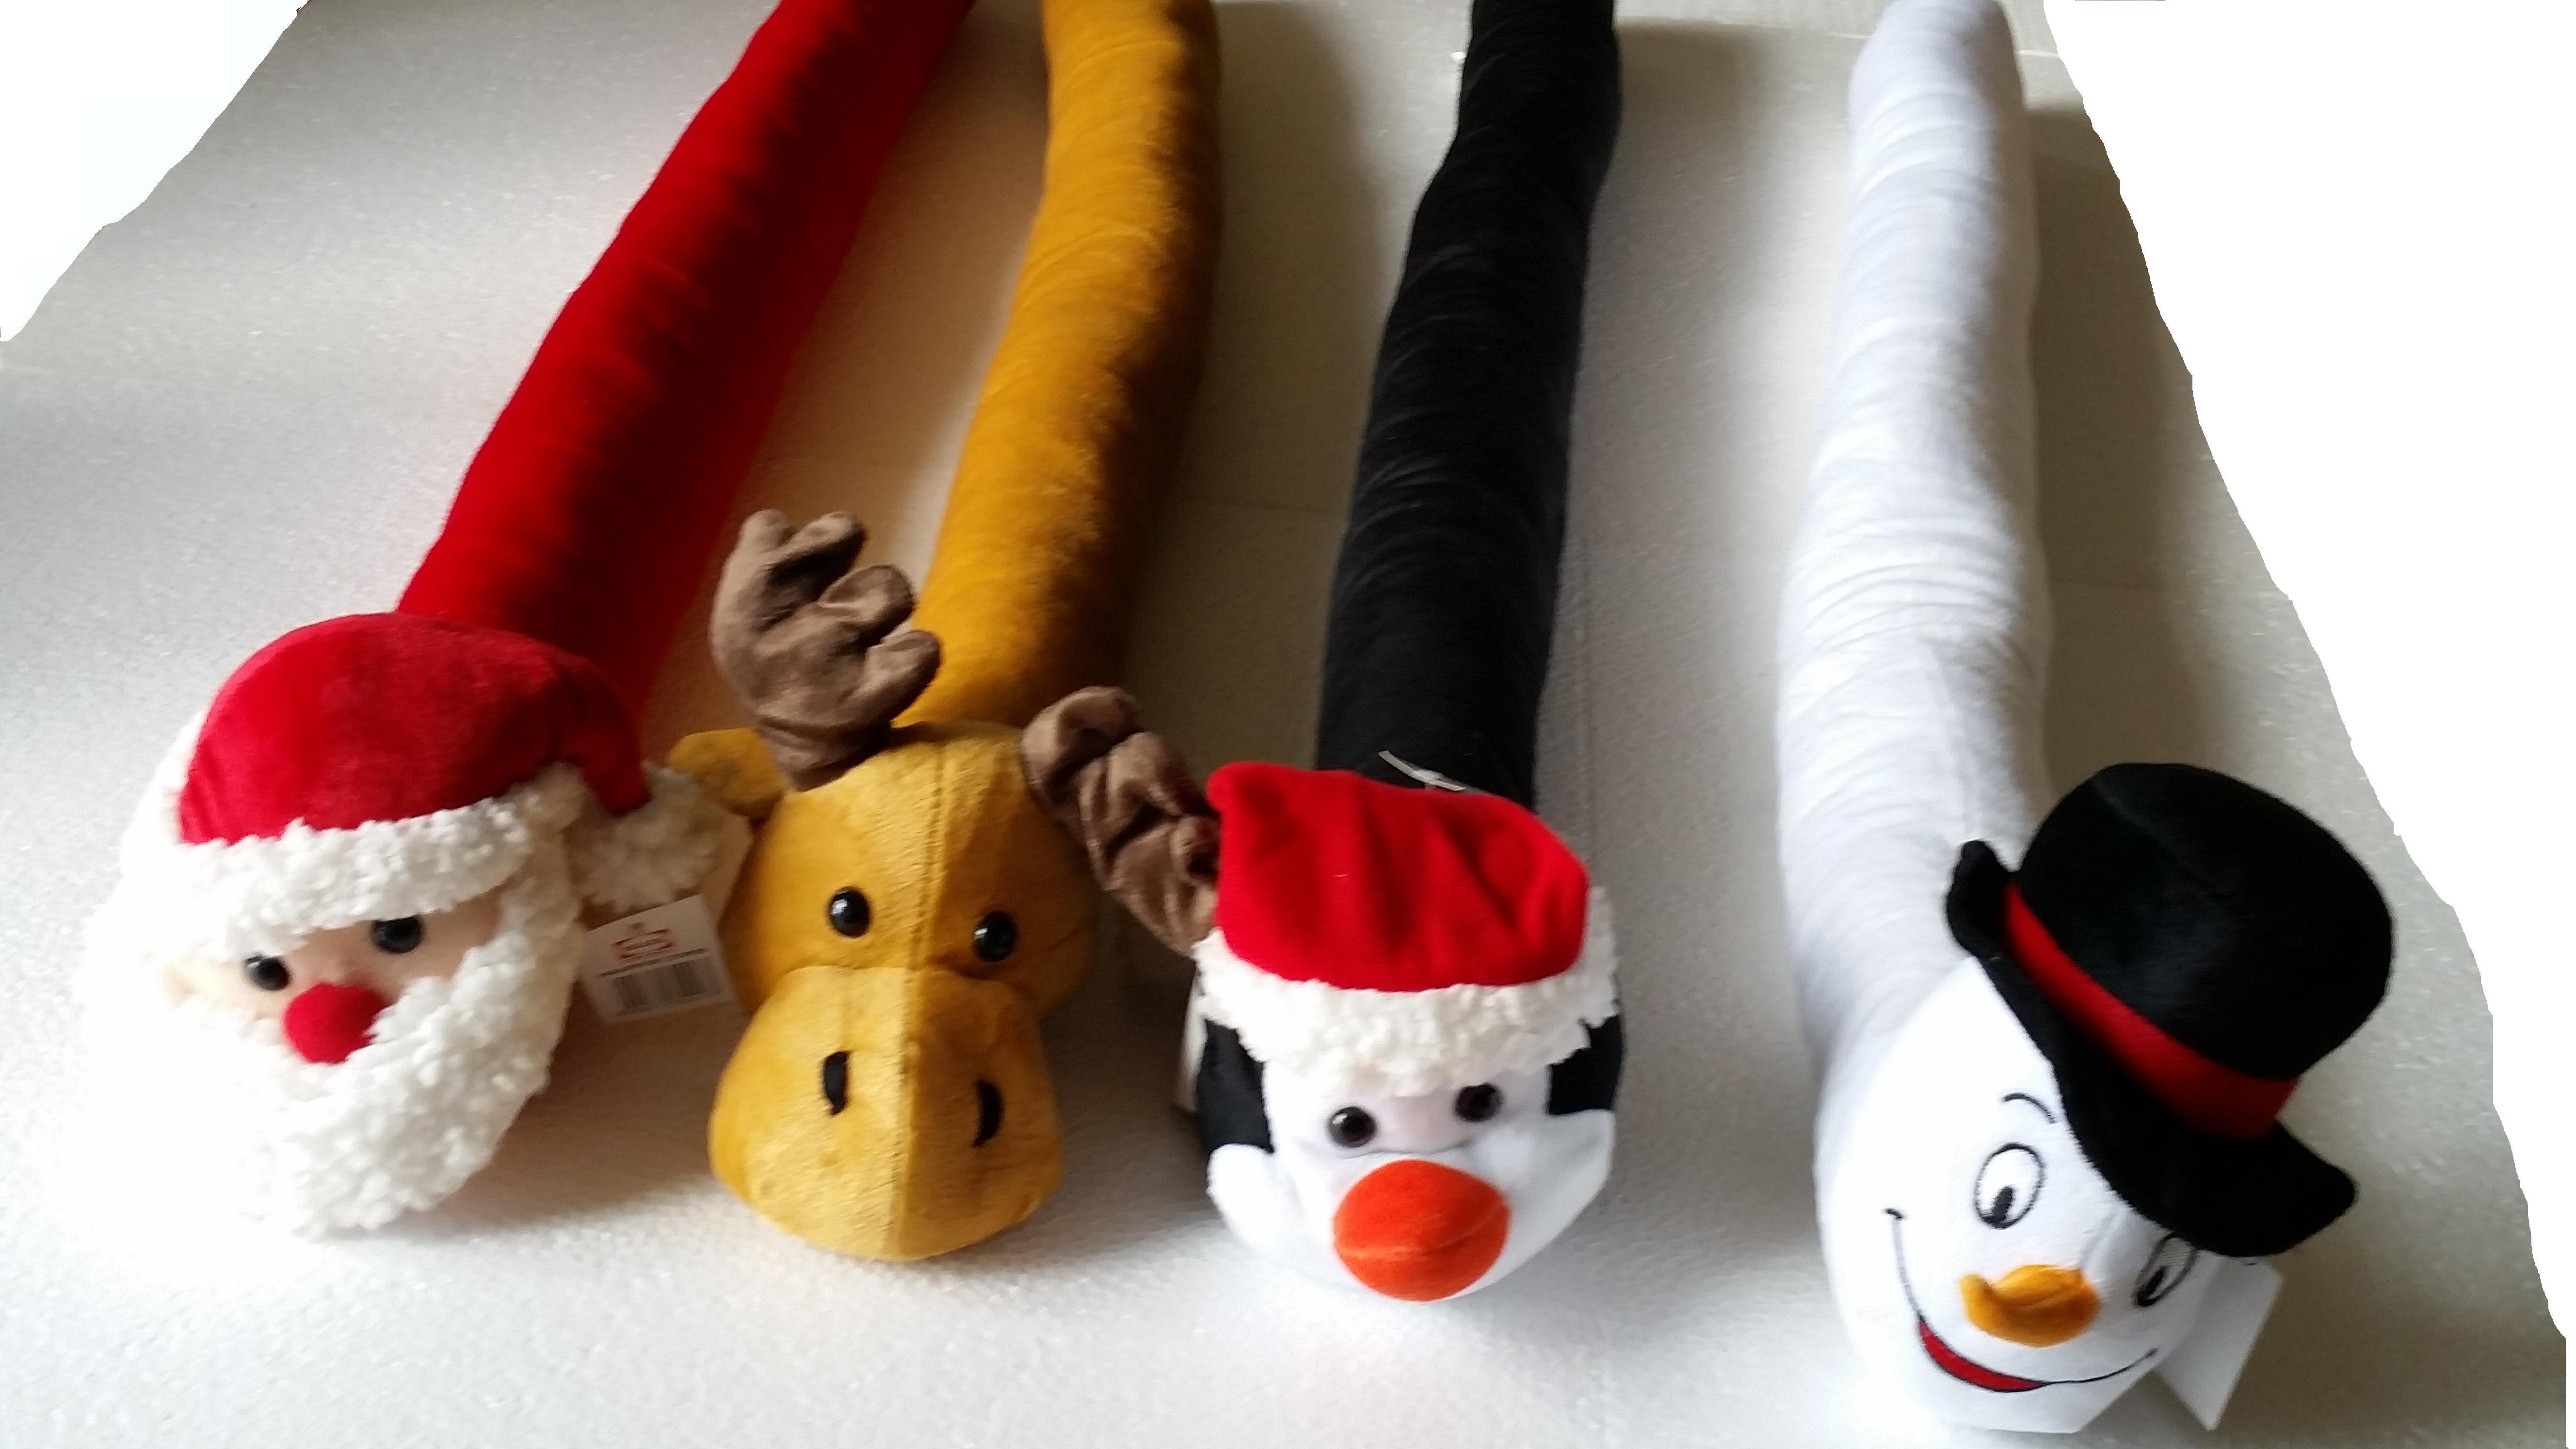 Paraspifferi Natale Ideadicasa